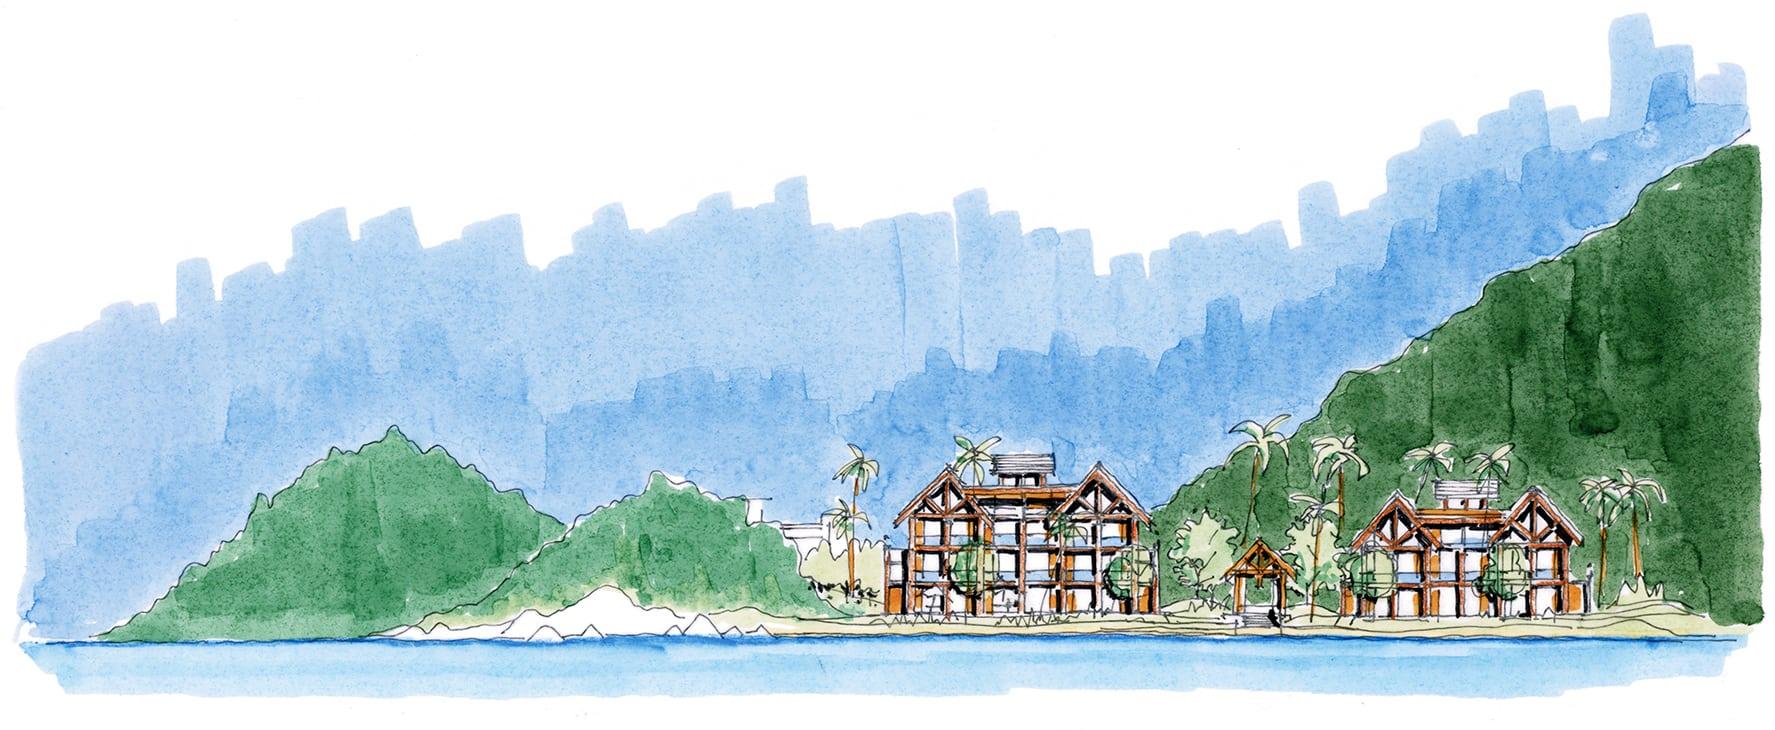 EC88 Hon Thi Island_elevation_beachfront hotelEKISTICS